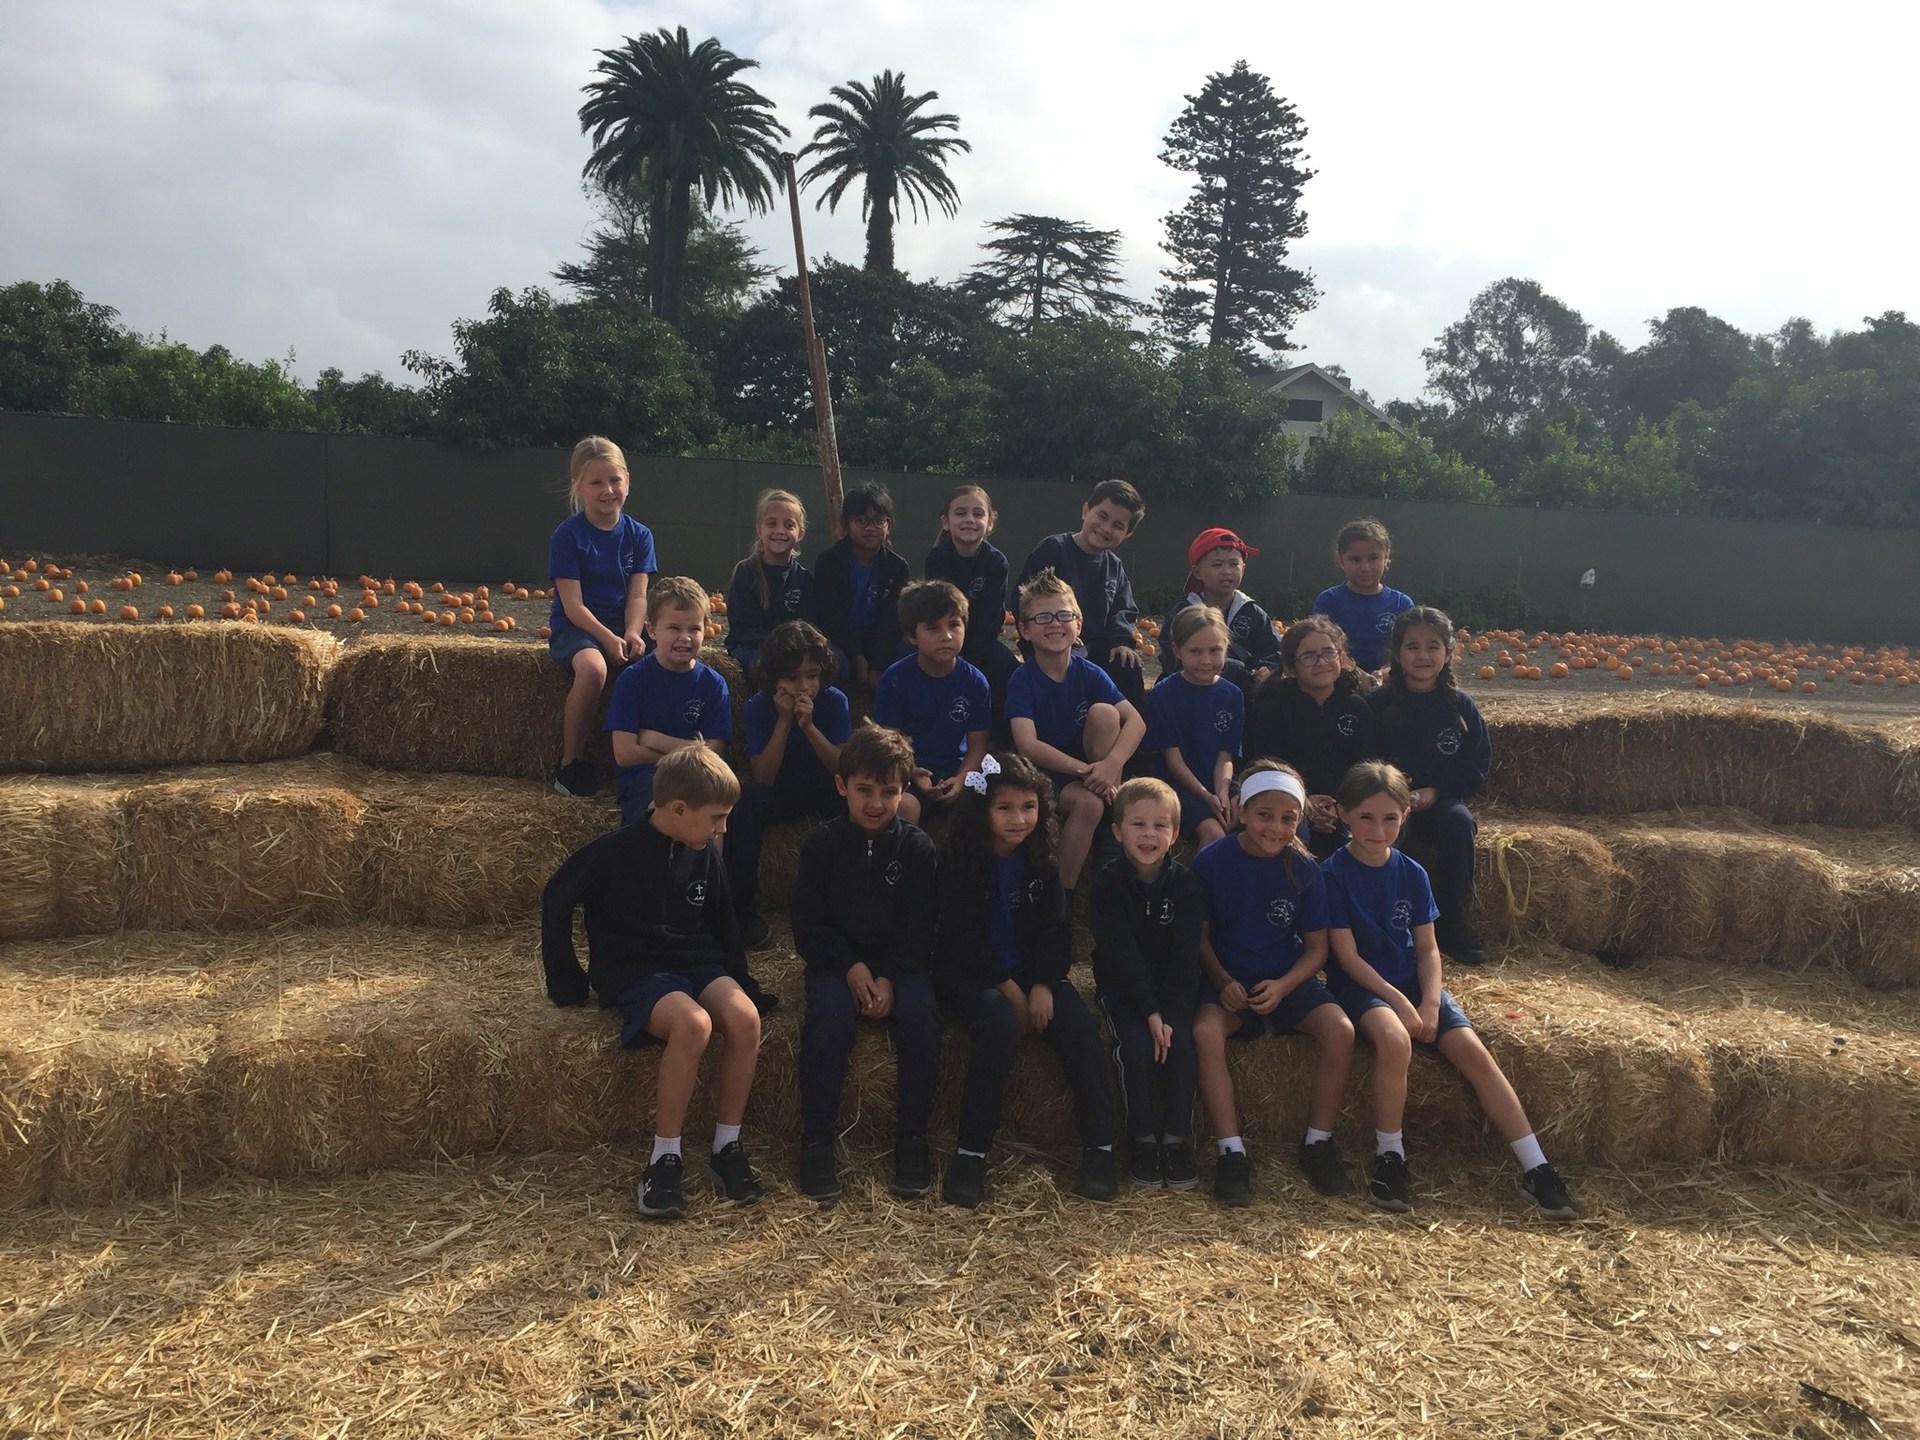 Field trip to the pumpkin patch